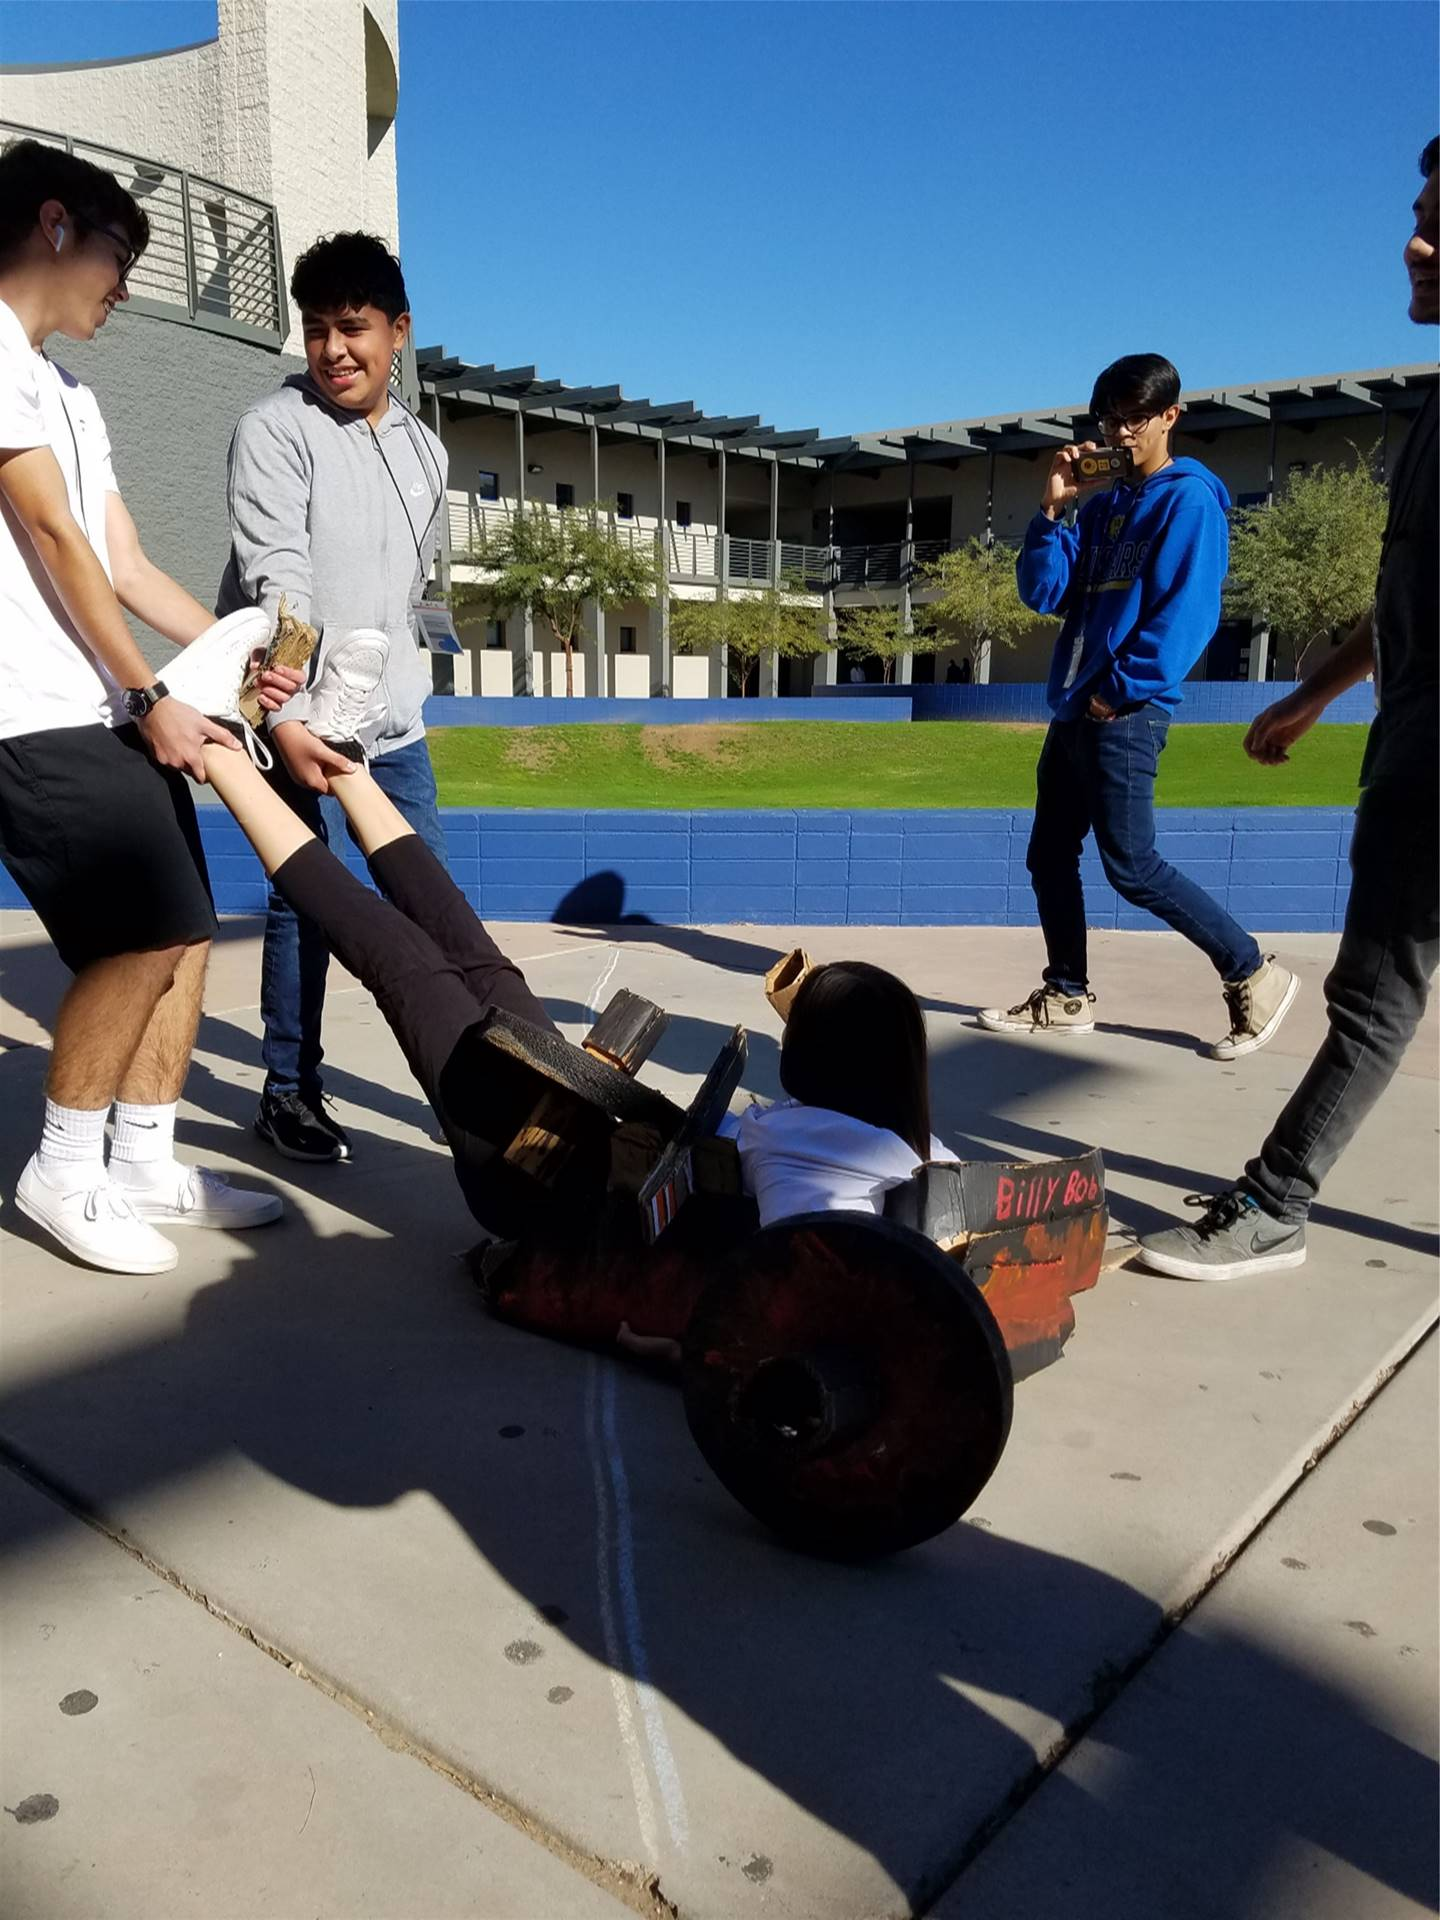 Engineering I Great Cardboard Chariot Race 20191211 (3)